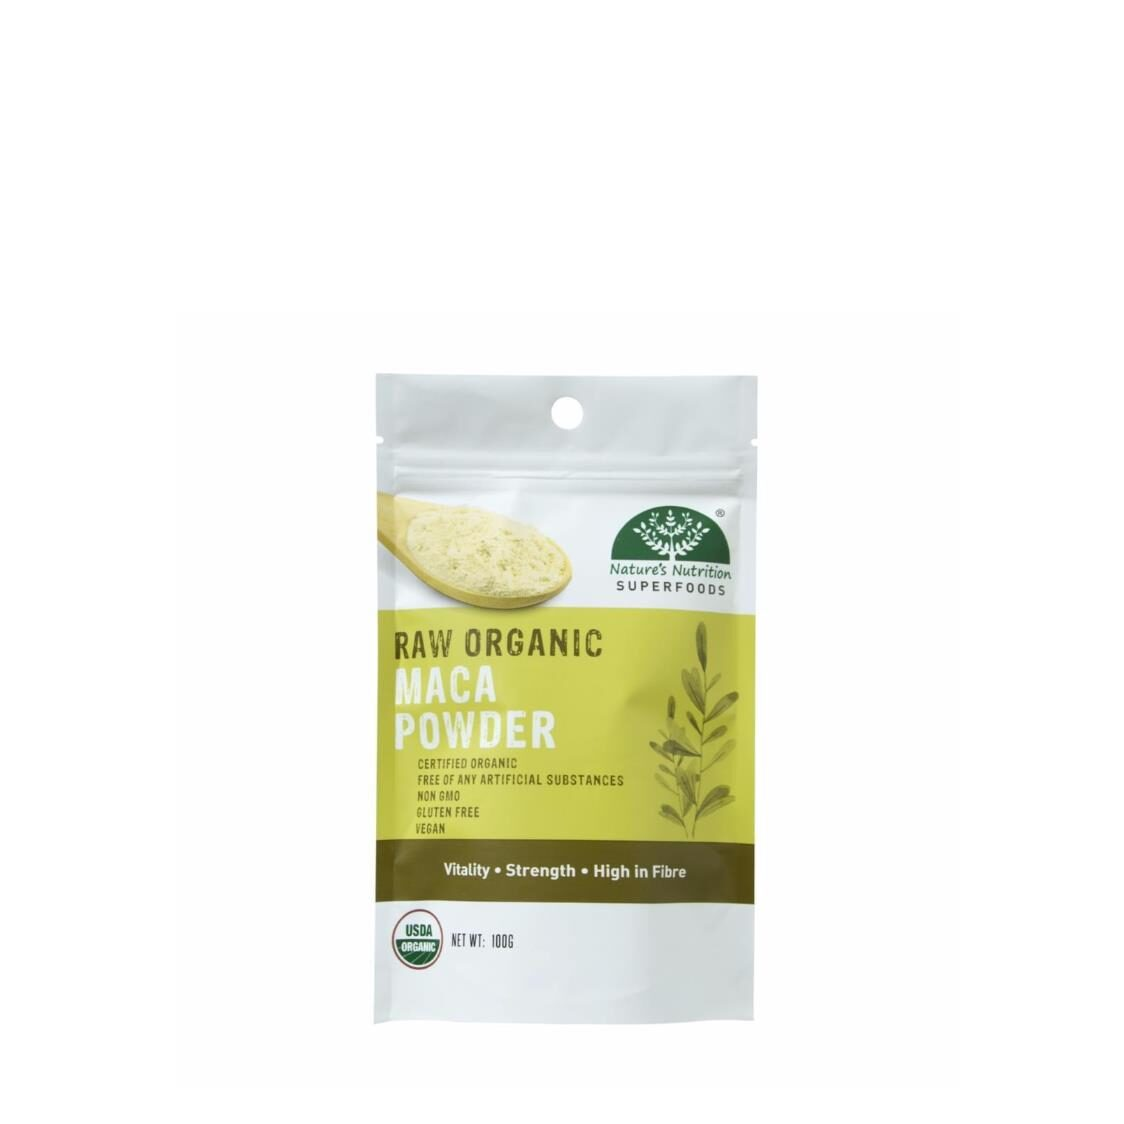 Natures Nutrition Organic Maca Powder 100g